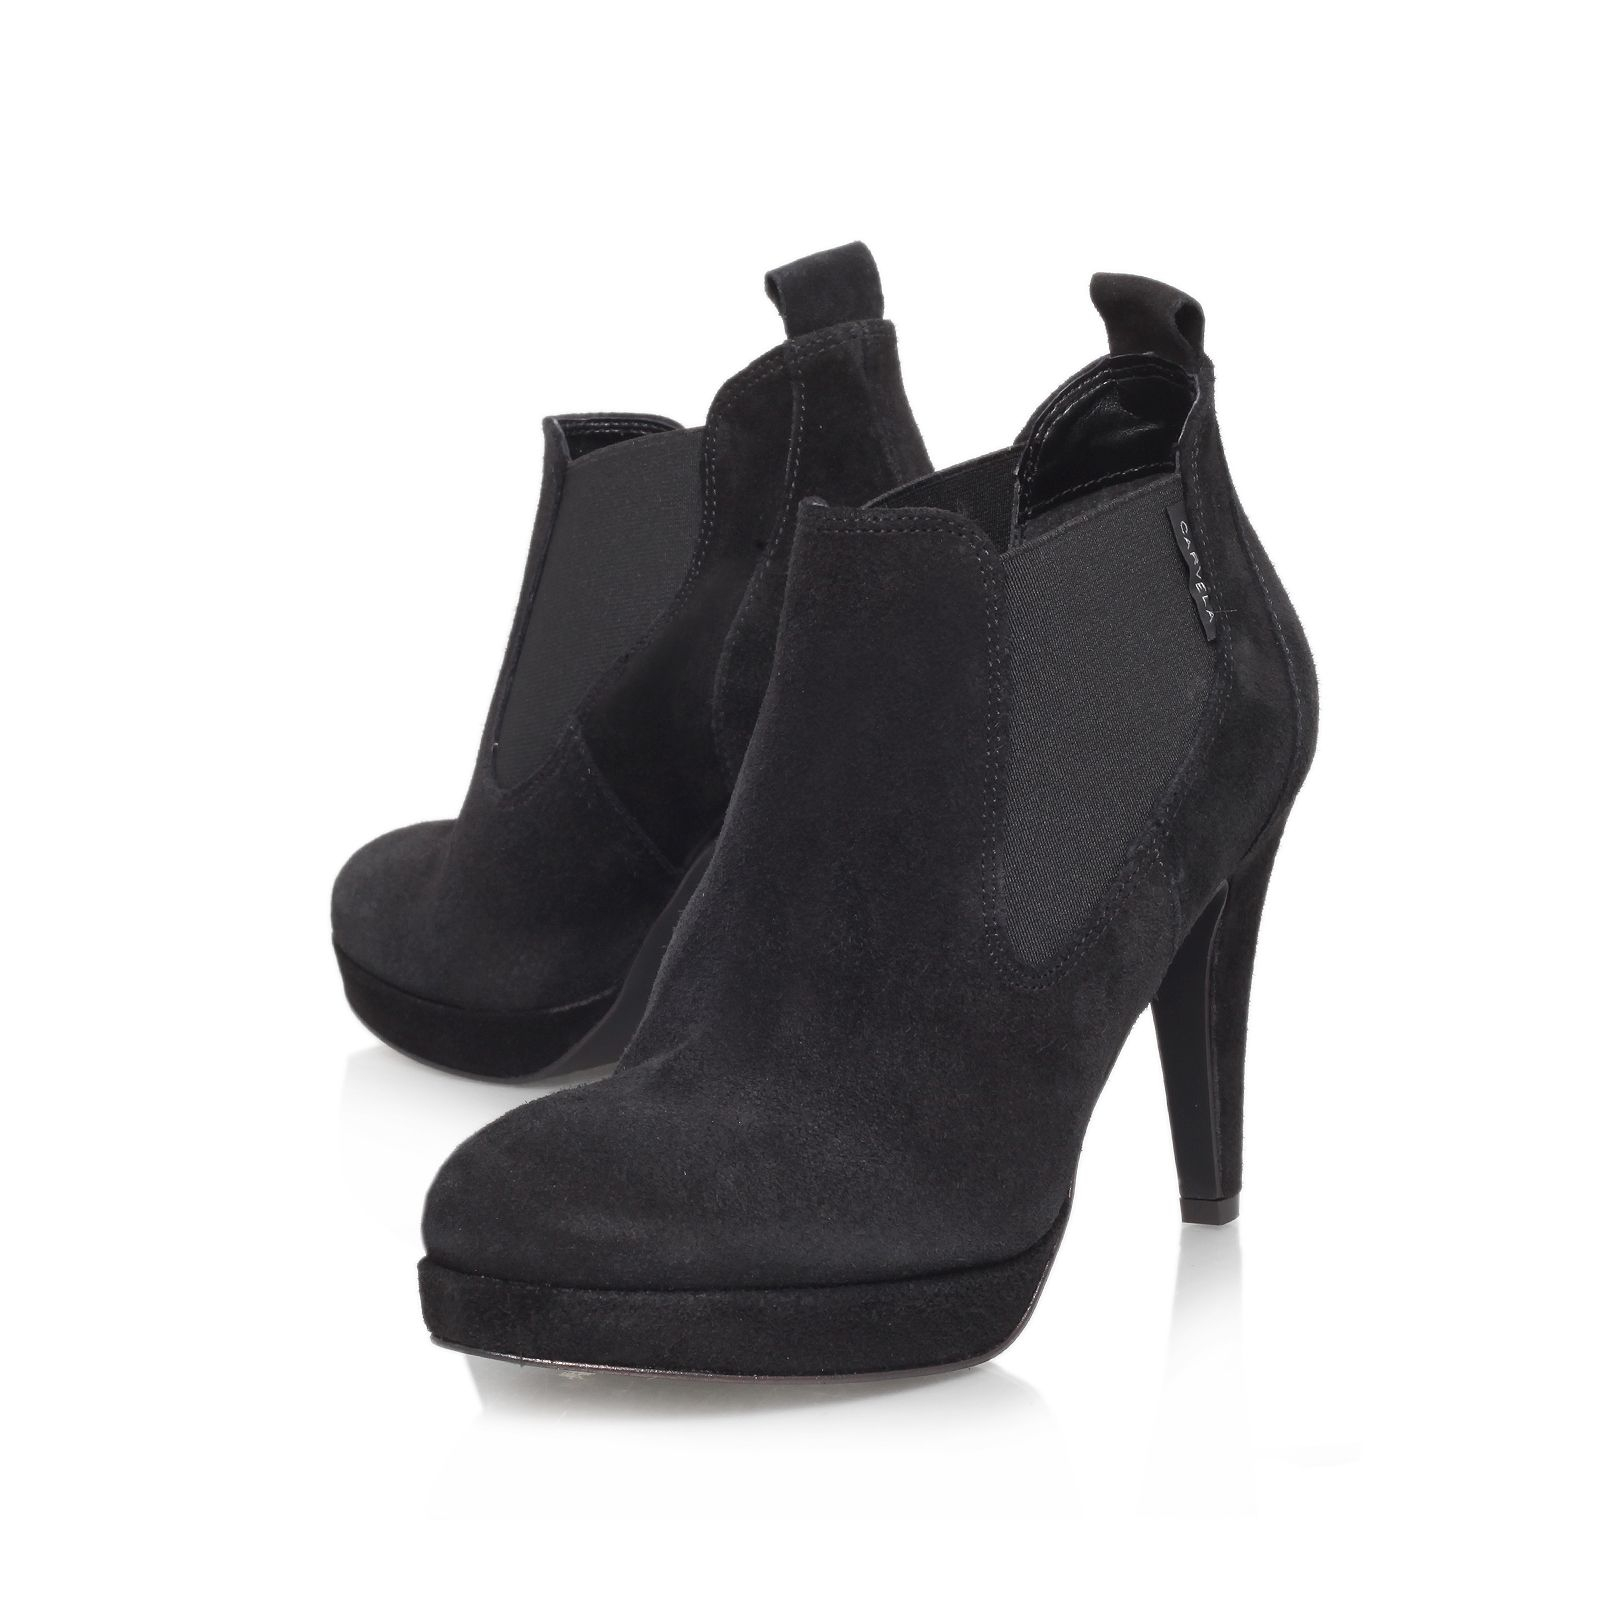 carvela kurt geiger air high heeled shoe boot in black lyst